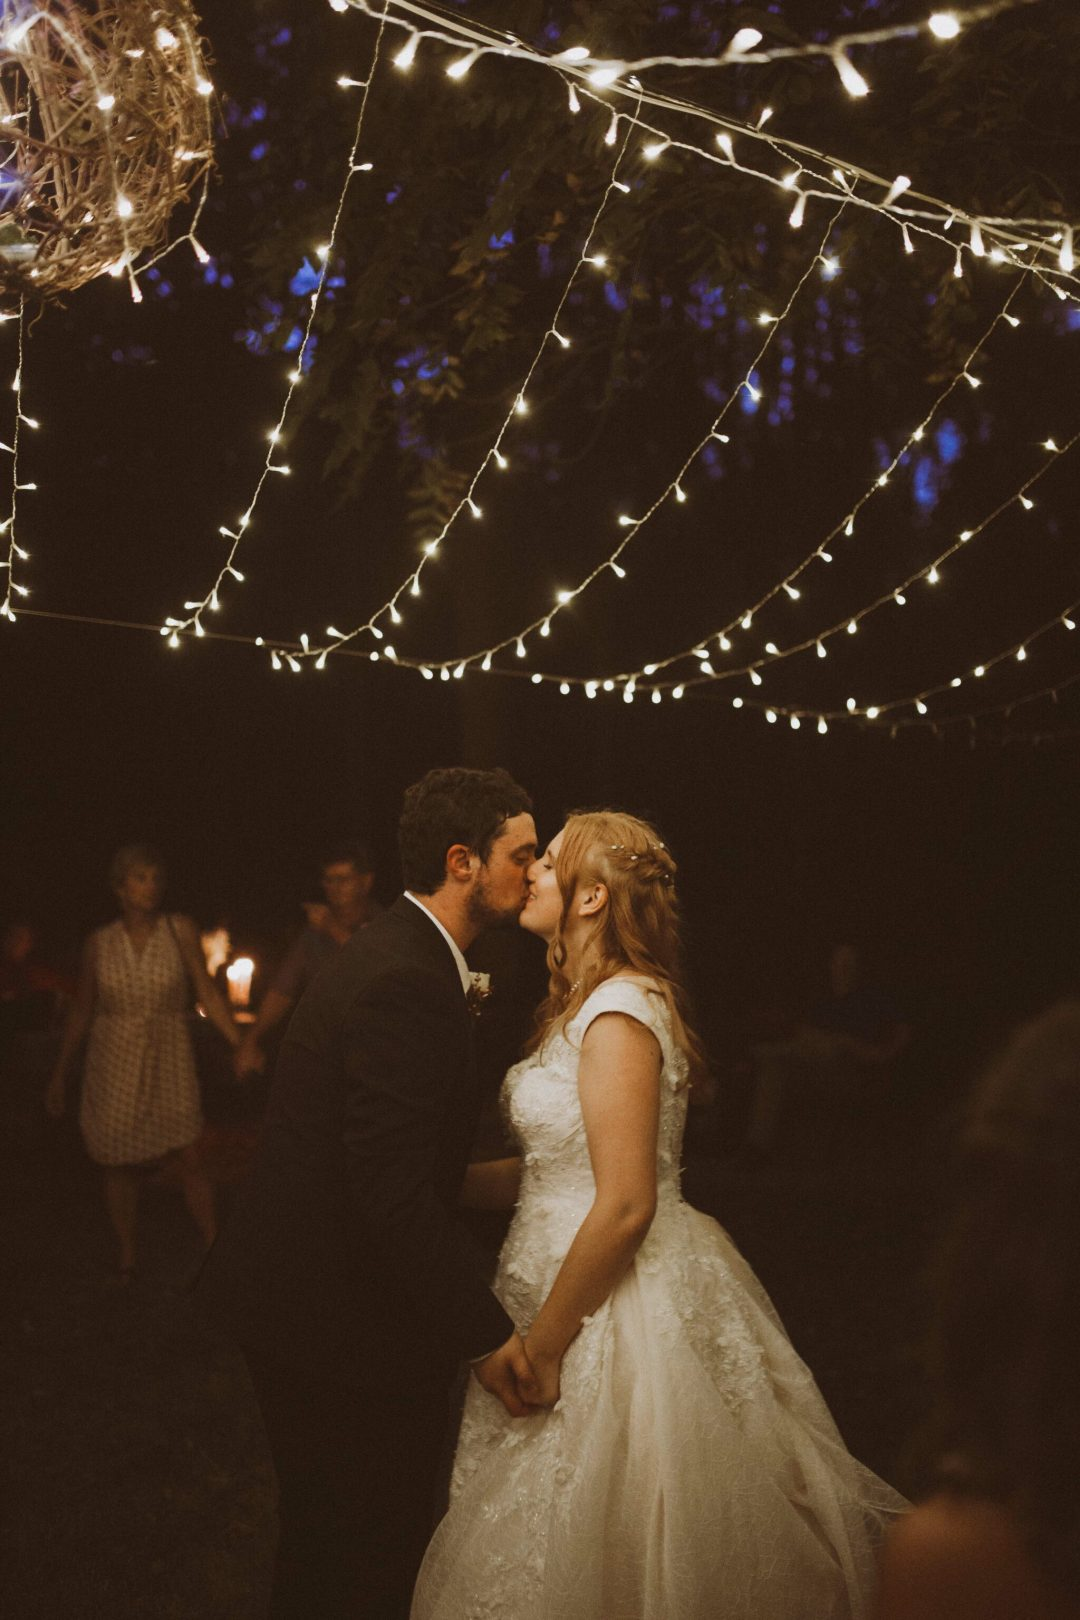 bride groom first dance outdoor string lights